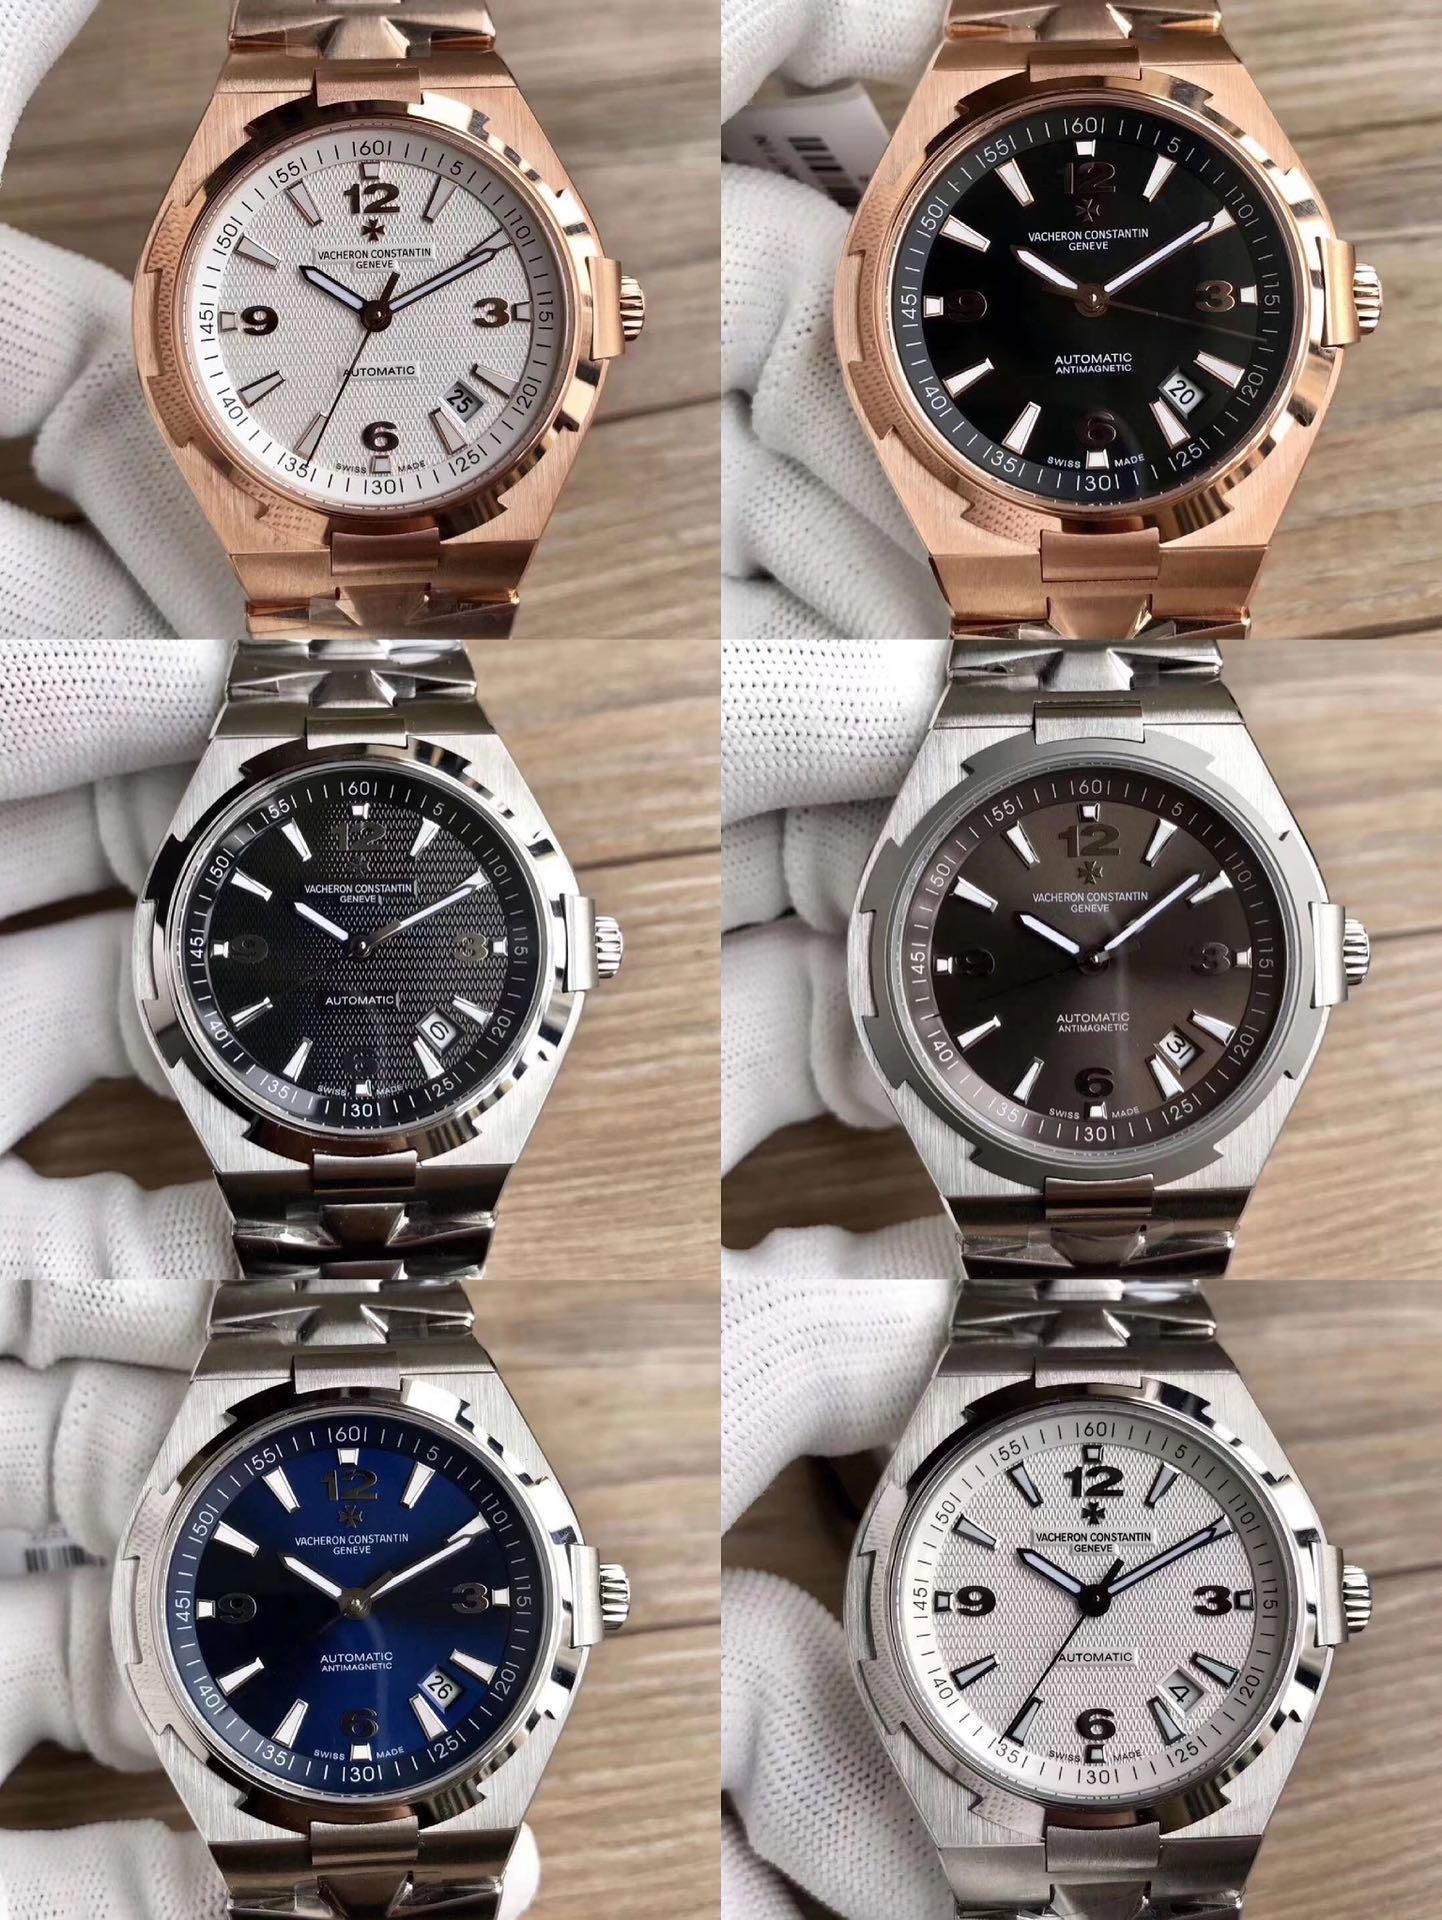 8F厂江诗丹顿 浪琴 积家 宝珀 全家福N廠 勞力士日志全系列 N廠手錶 高仿手錶 仿錶 複刻錶 一比一複刻手錶